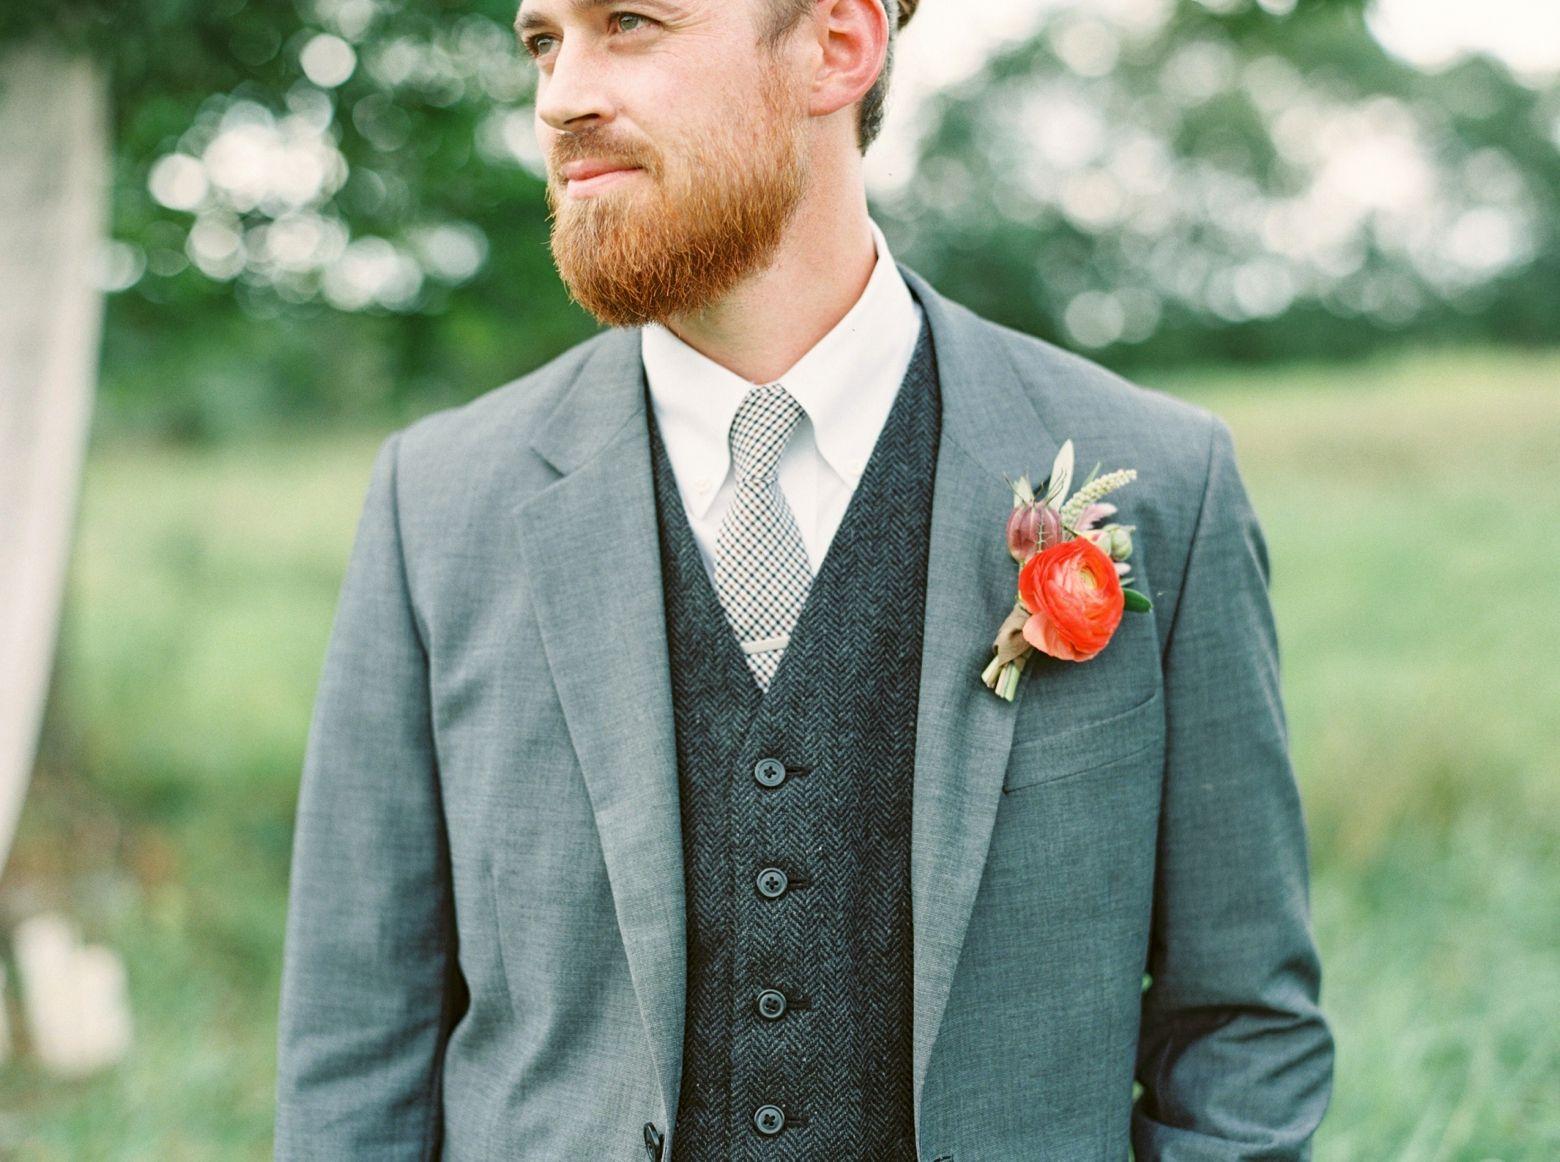 Groom style.   The Groom   Pinterest   Groom style, Bodas and Wedding